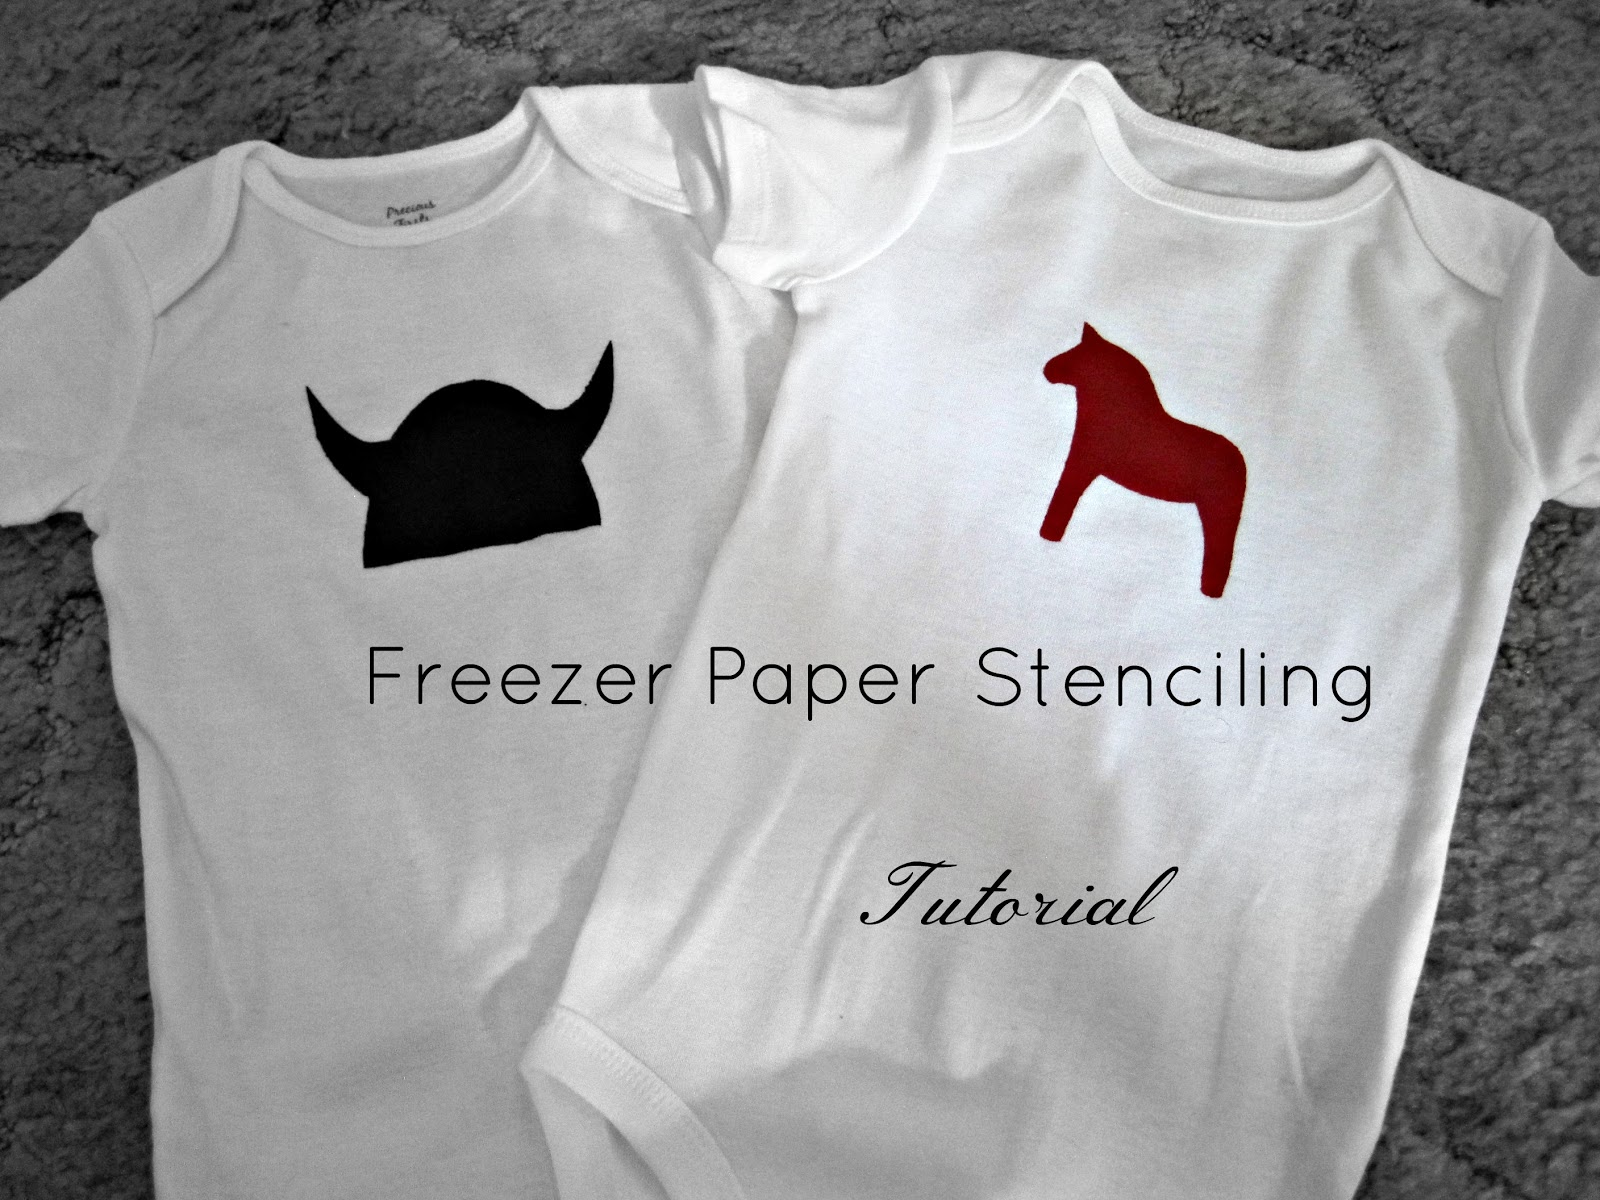 http://1.bp.blogspot.com/-0evFvXQvdOI/UNIPa8ZReoI/AAAAAAAADYw/f1_bLaKe2kY/s1600/Freezer+Paper+Stencil+Tutorial+Button.jpg